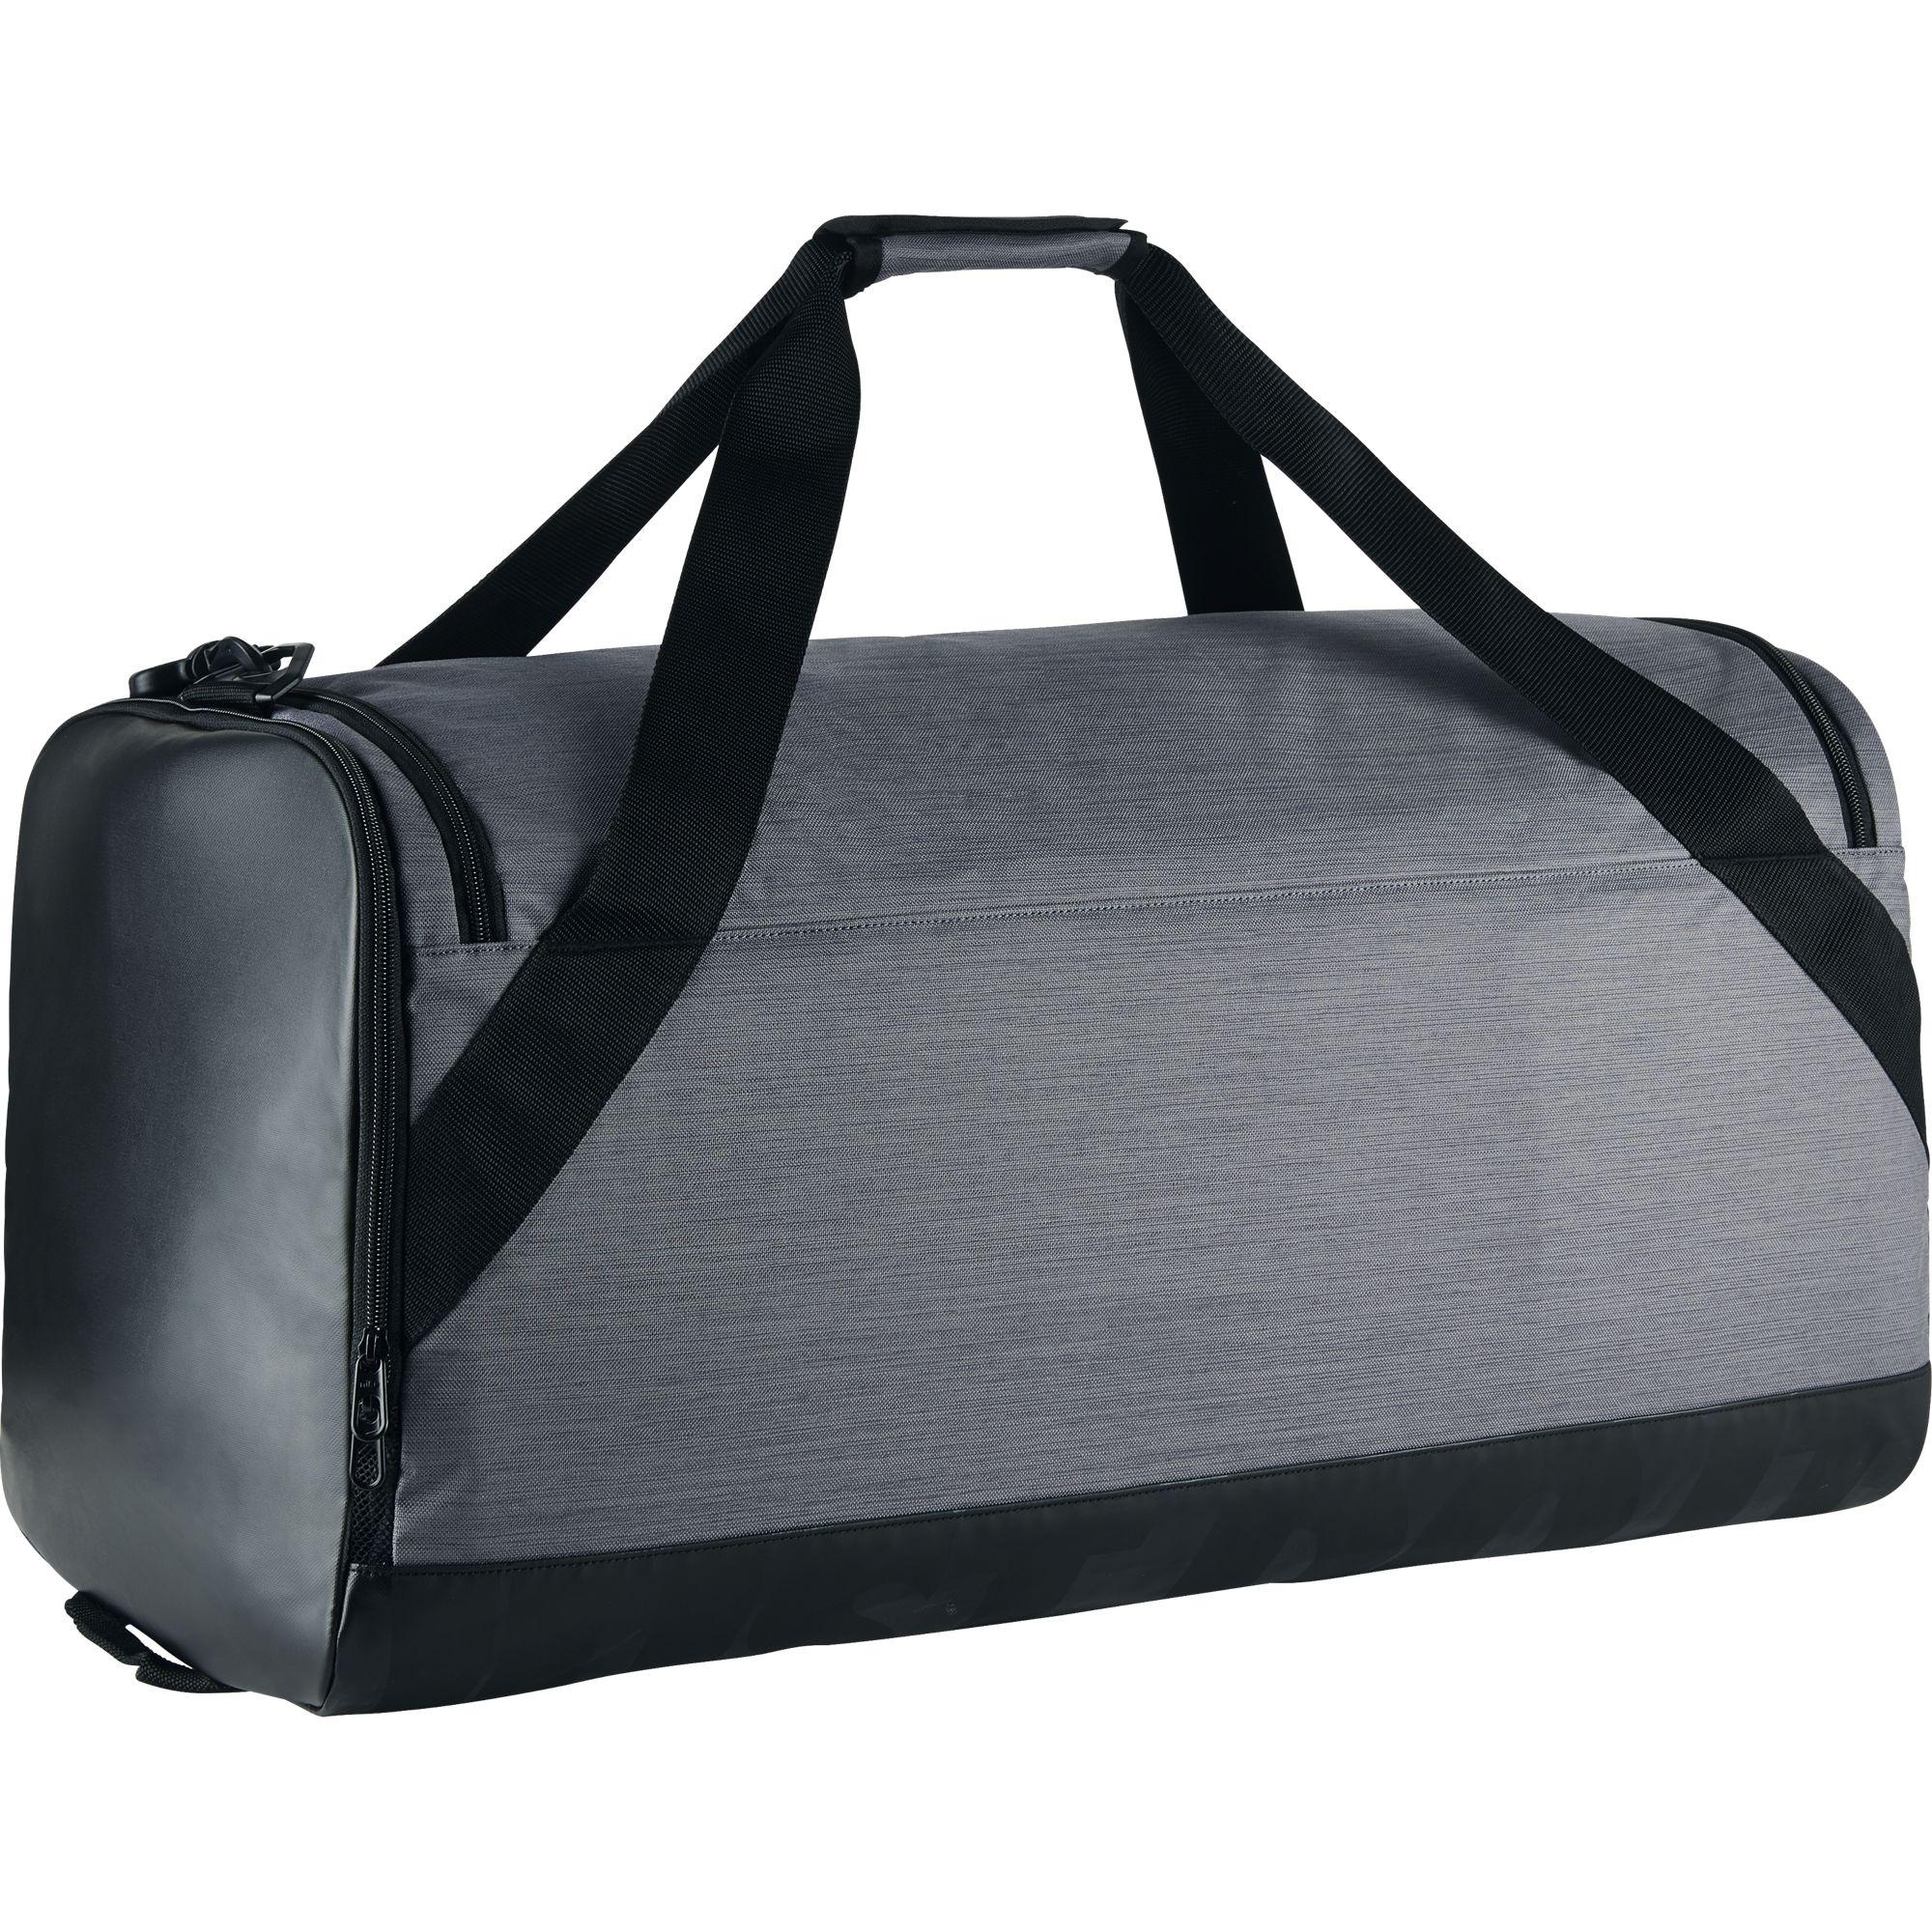 00fa33cd2c3 ... Small Duffle Bag BlkBlkWhite (308103001001- Black  finest selection  417c8 0a7d2 ... torba Nike Brasilia (Large) Training Duffel Bag ...